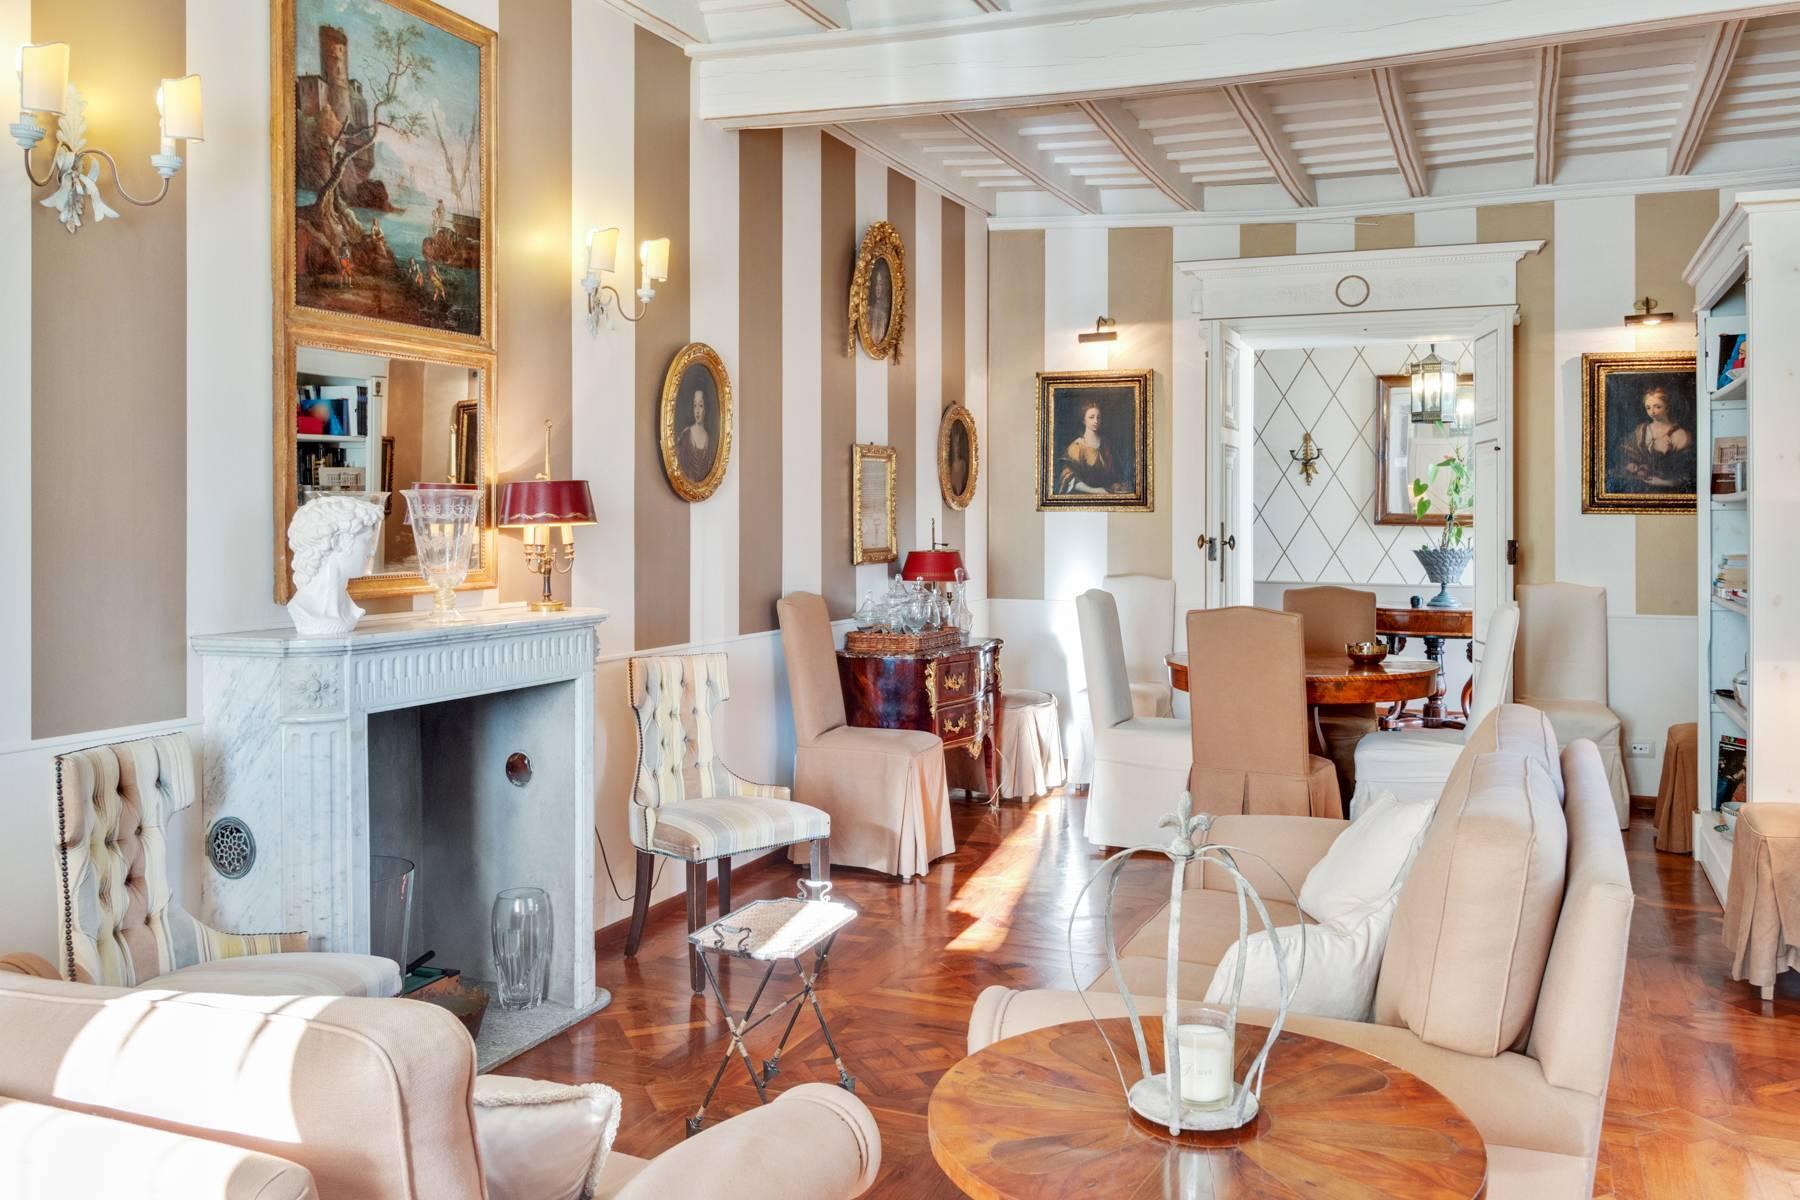 Casa indipendente in Vendita a Torino: 5 locali, 270 mq - Foto 4